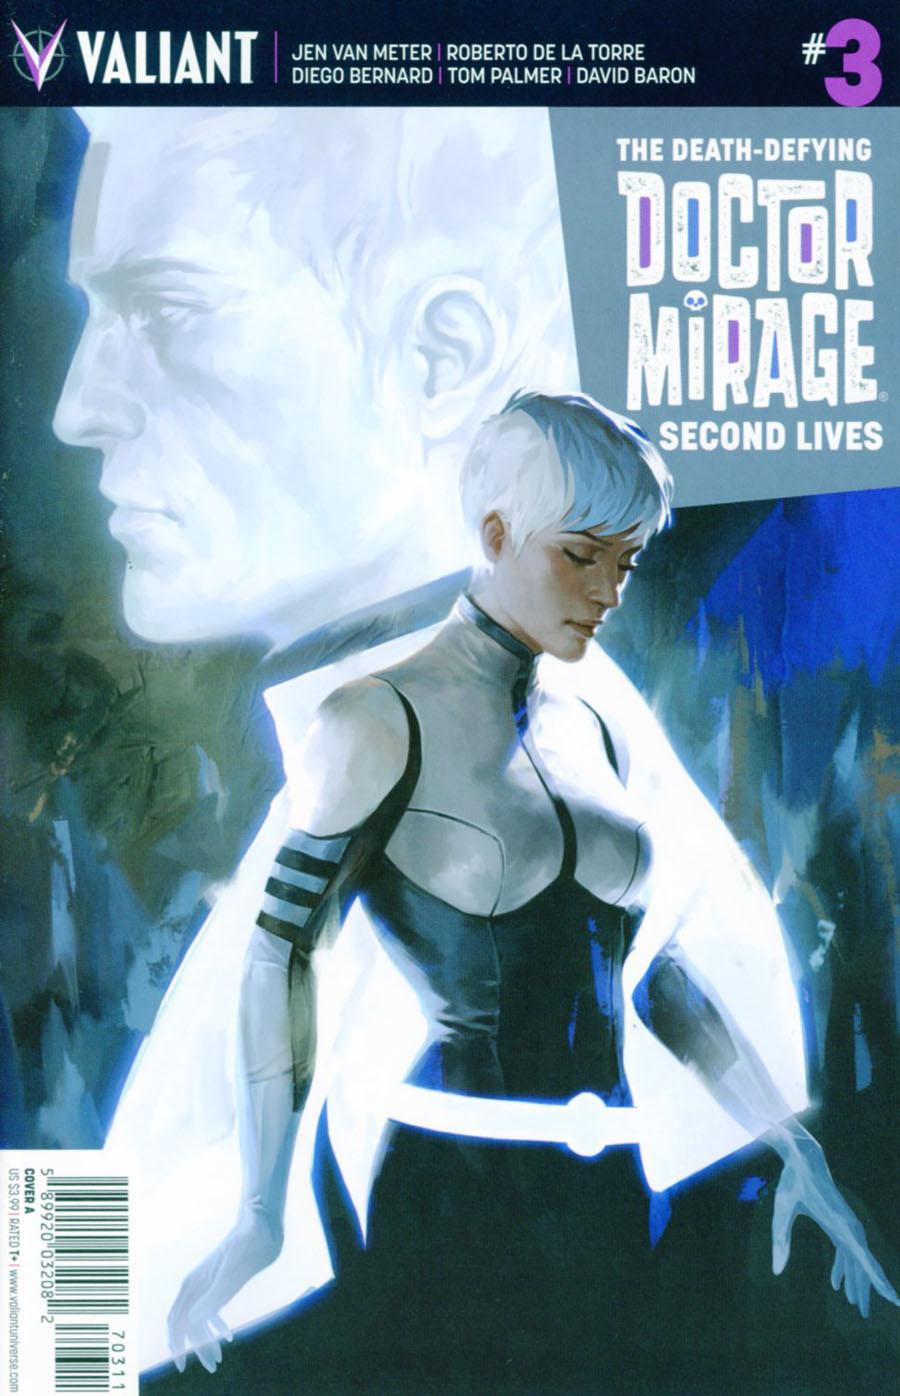 Death-Defying Doctor Mirage Second Lives #3 Cover A Regular Jelena Kevic-Djurdjevic Cover